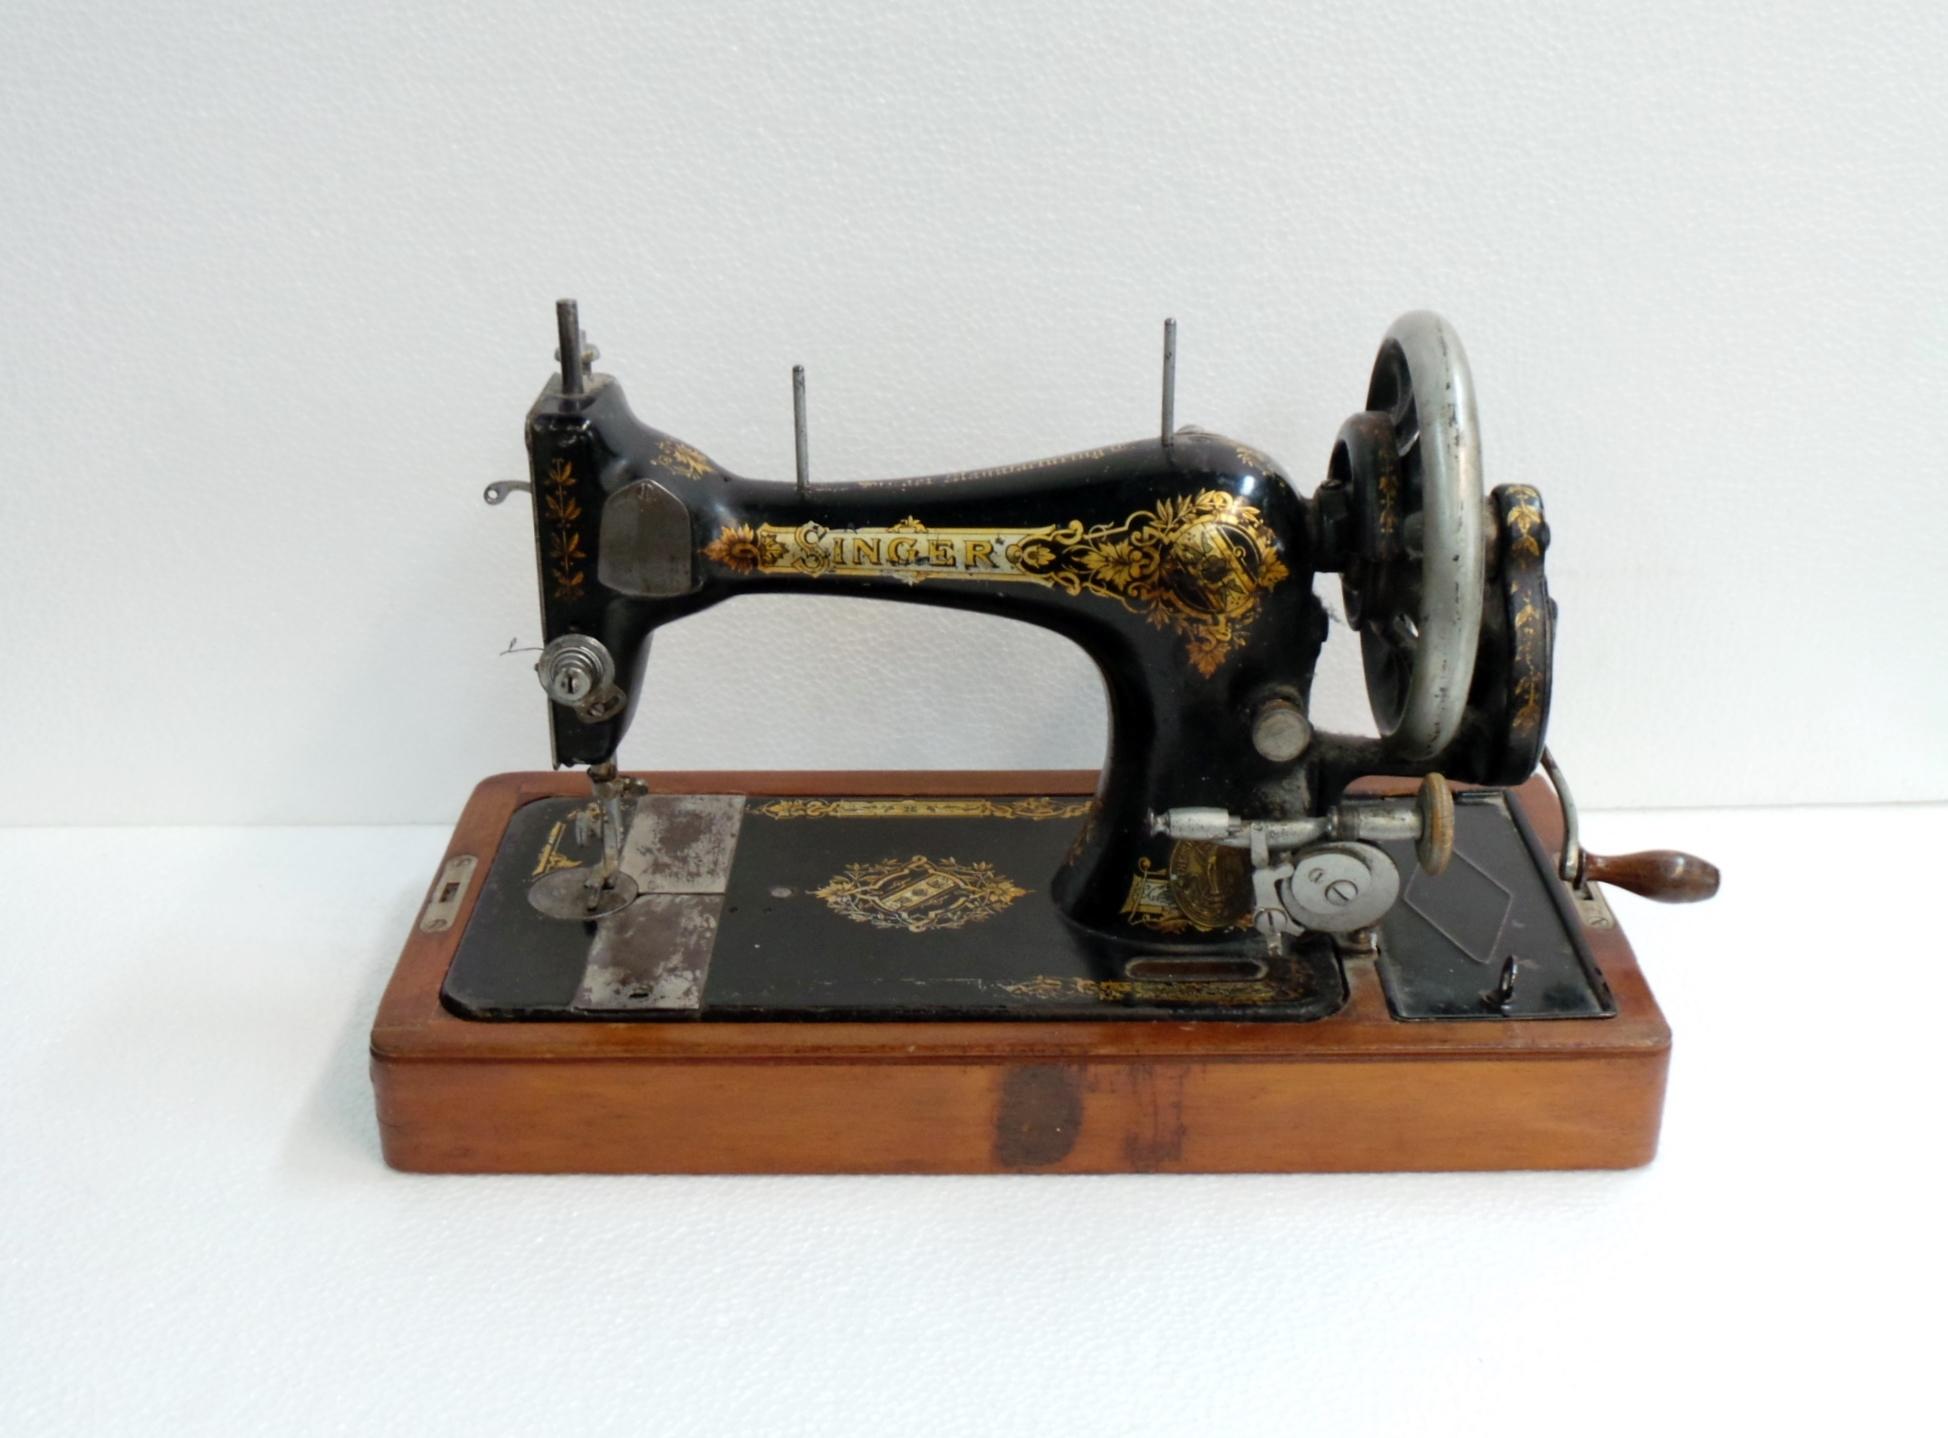 macchina da cucire singer da tavolo